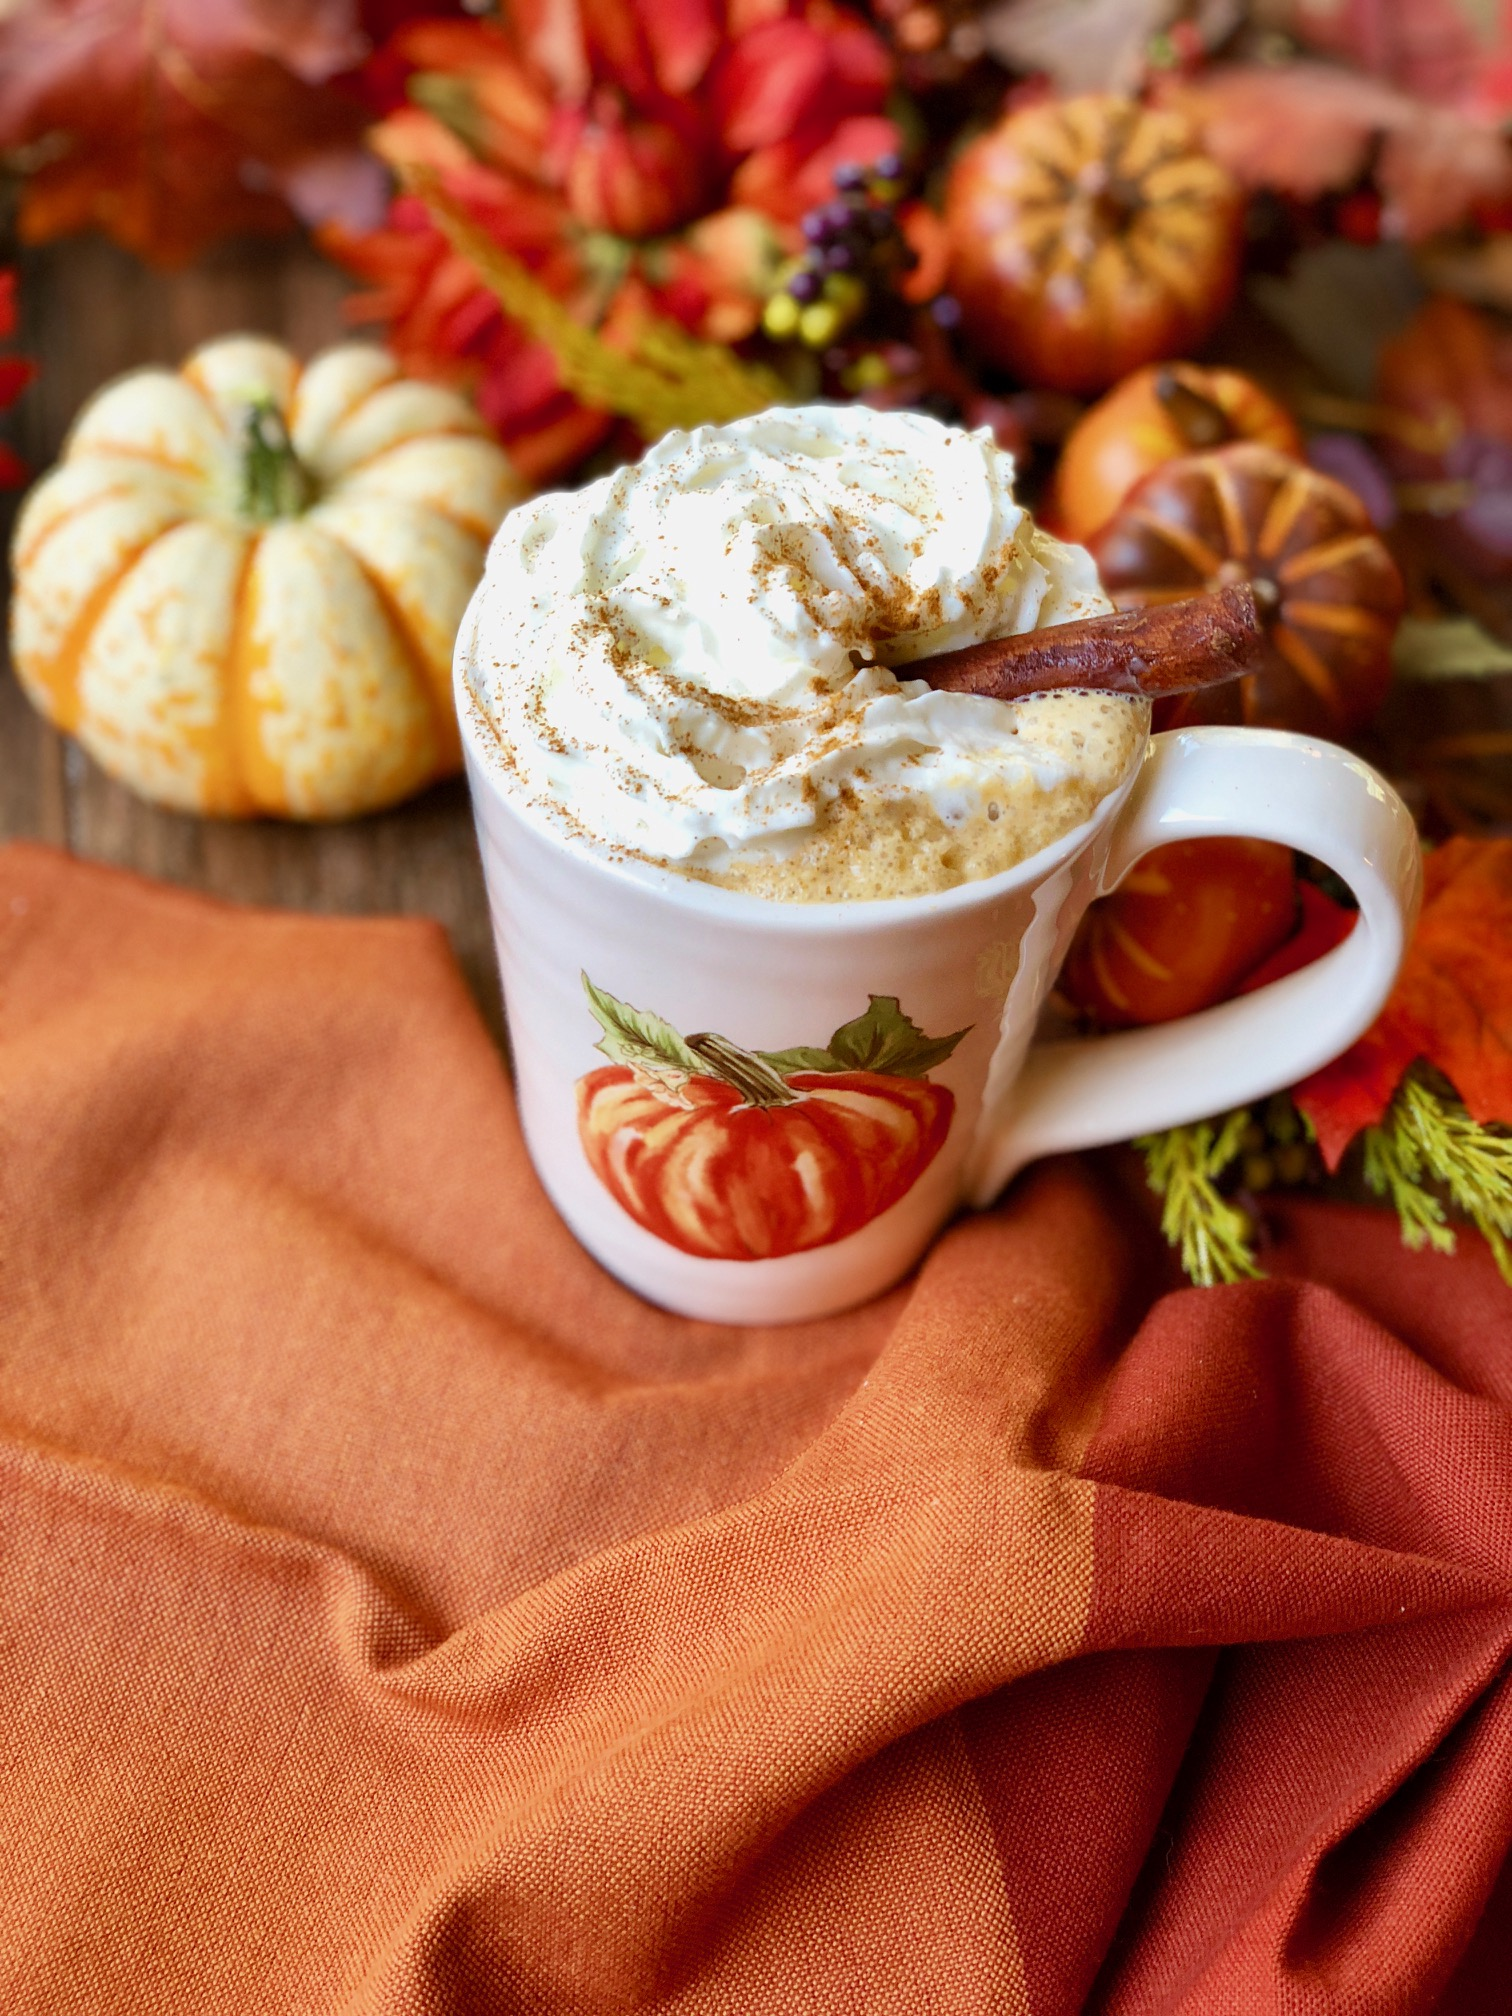 Easy Homemade Pumpkin Spice Latte Recipe (Healthy, Non-Dairy)